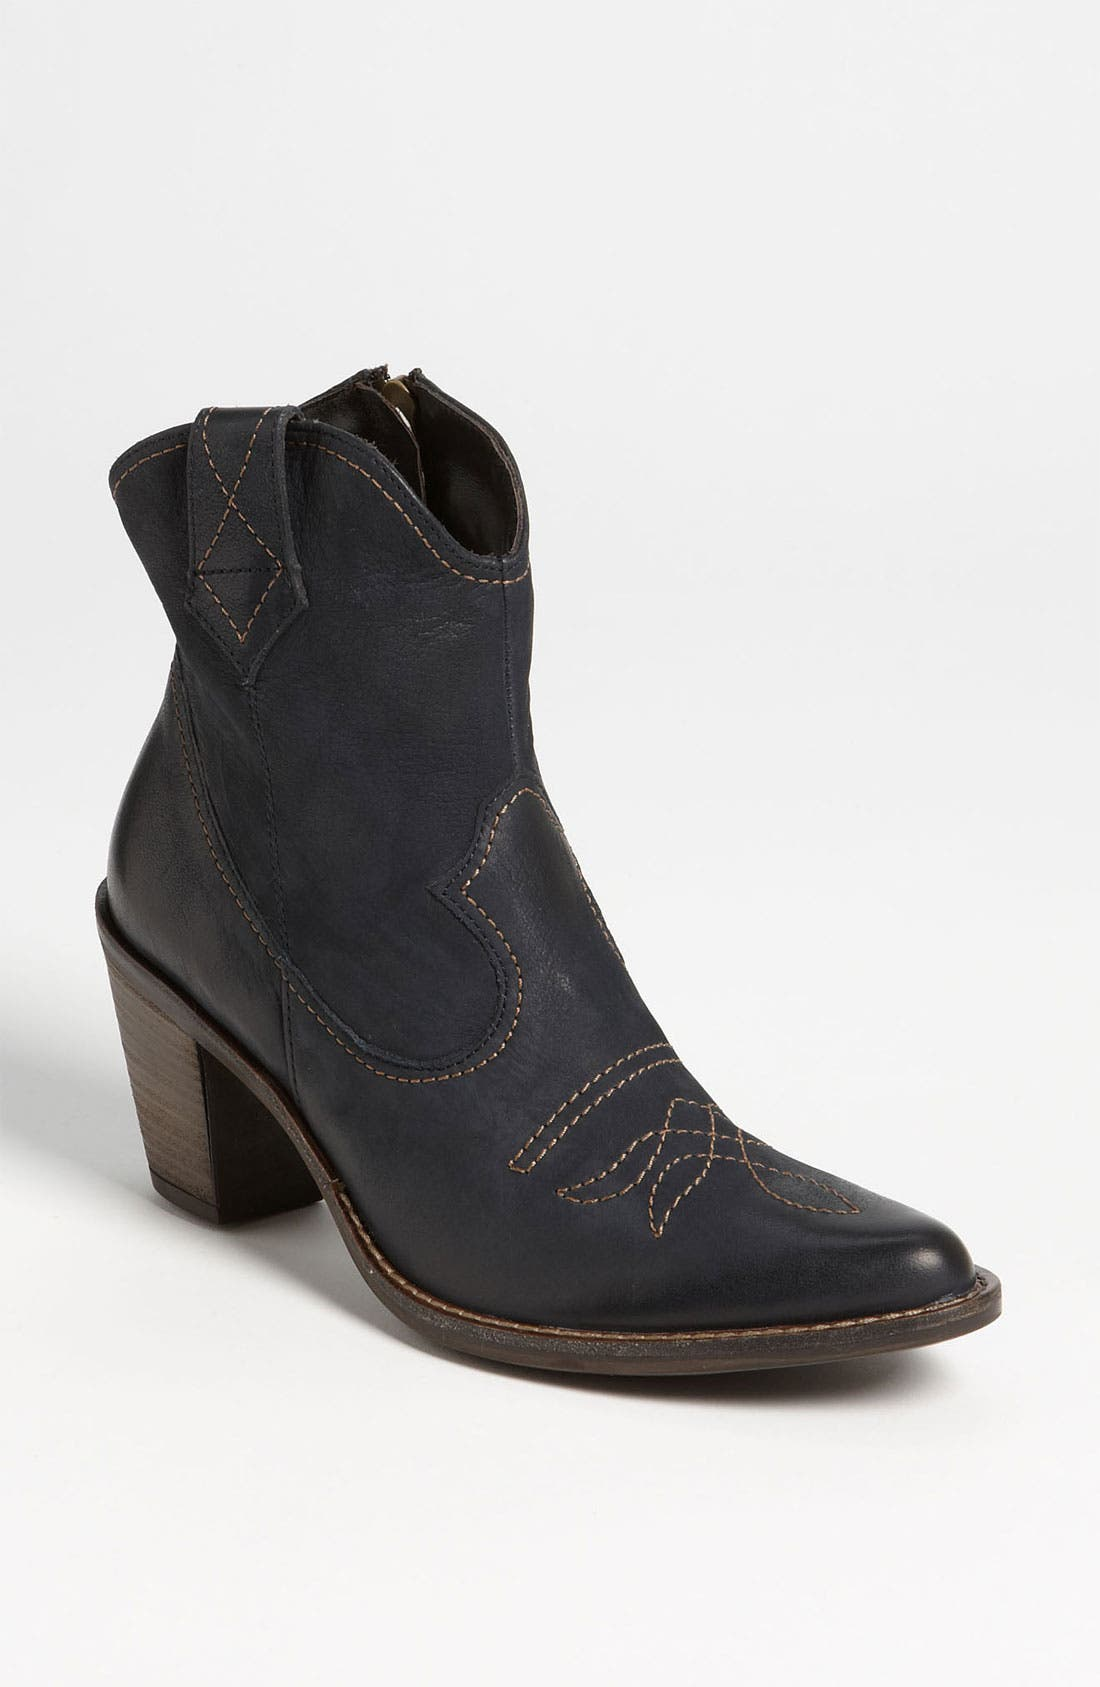 Alternate Image 1 Selected - Paul Green 'Mason' Boot